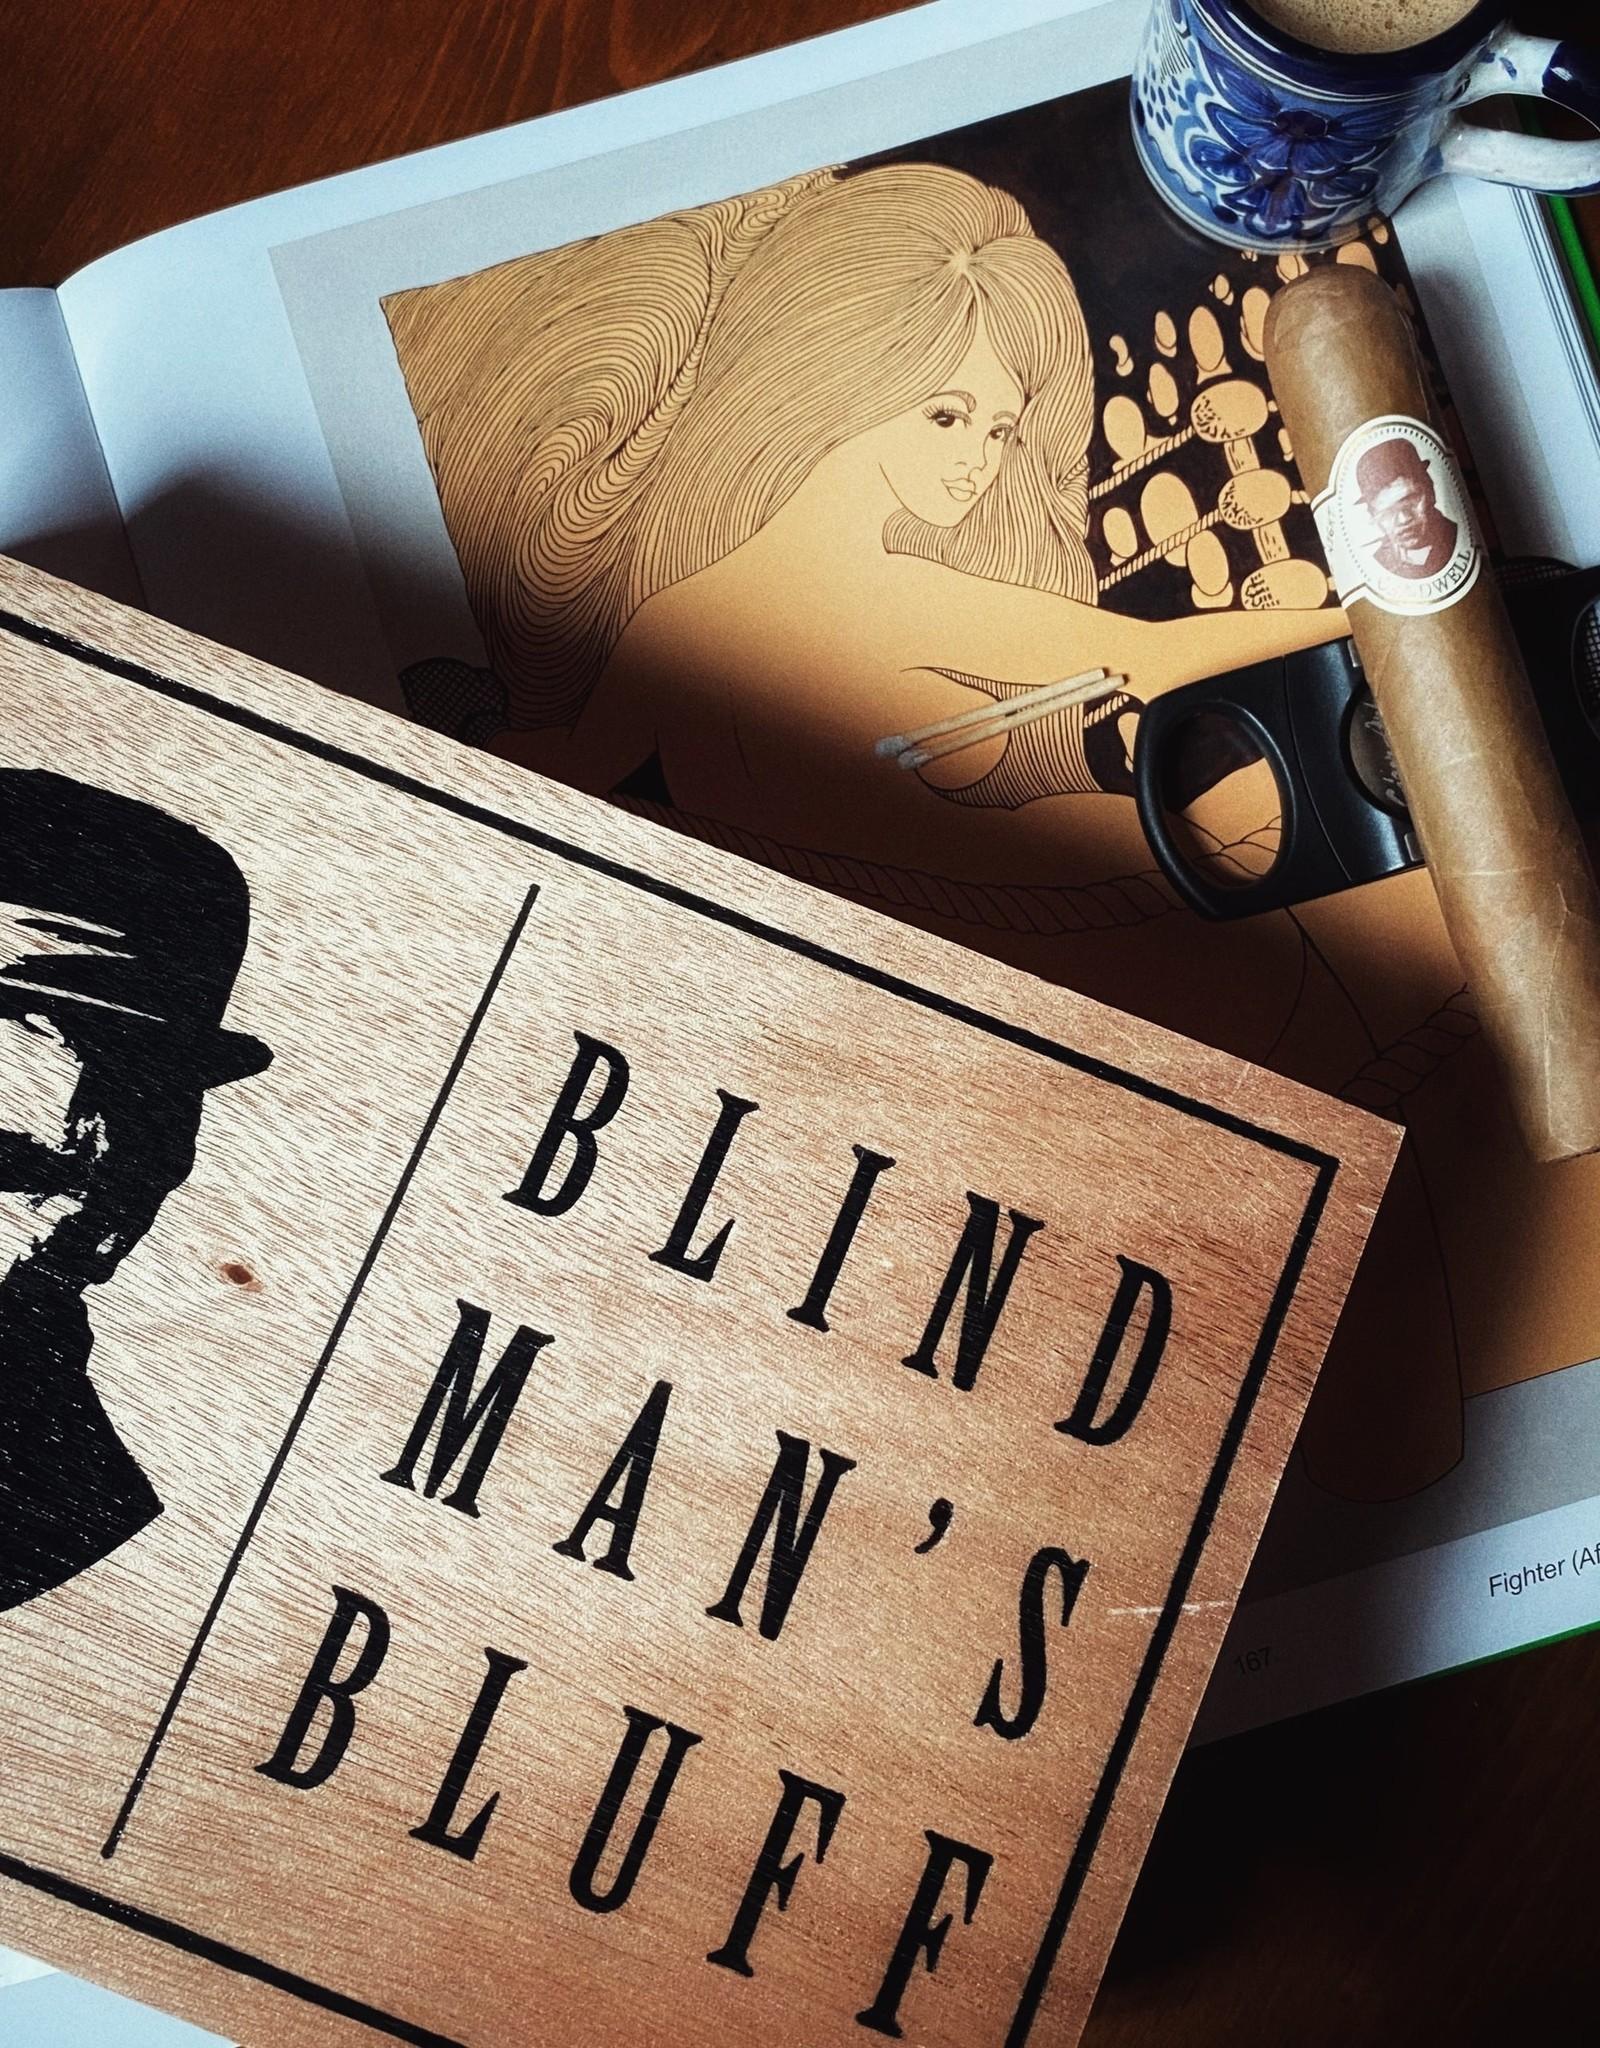 Caldwell Cigar Co Caldwell Blind Man's Bluff Connecticut 6 x 60 Box of 20